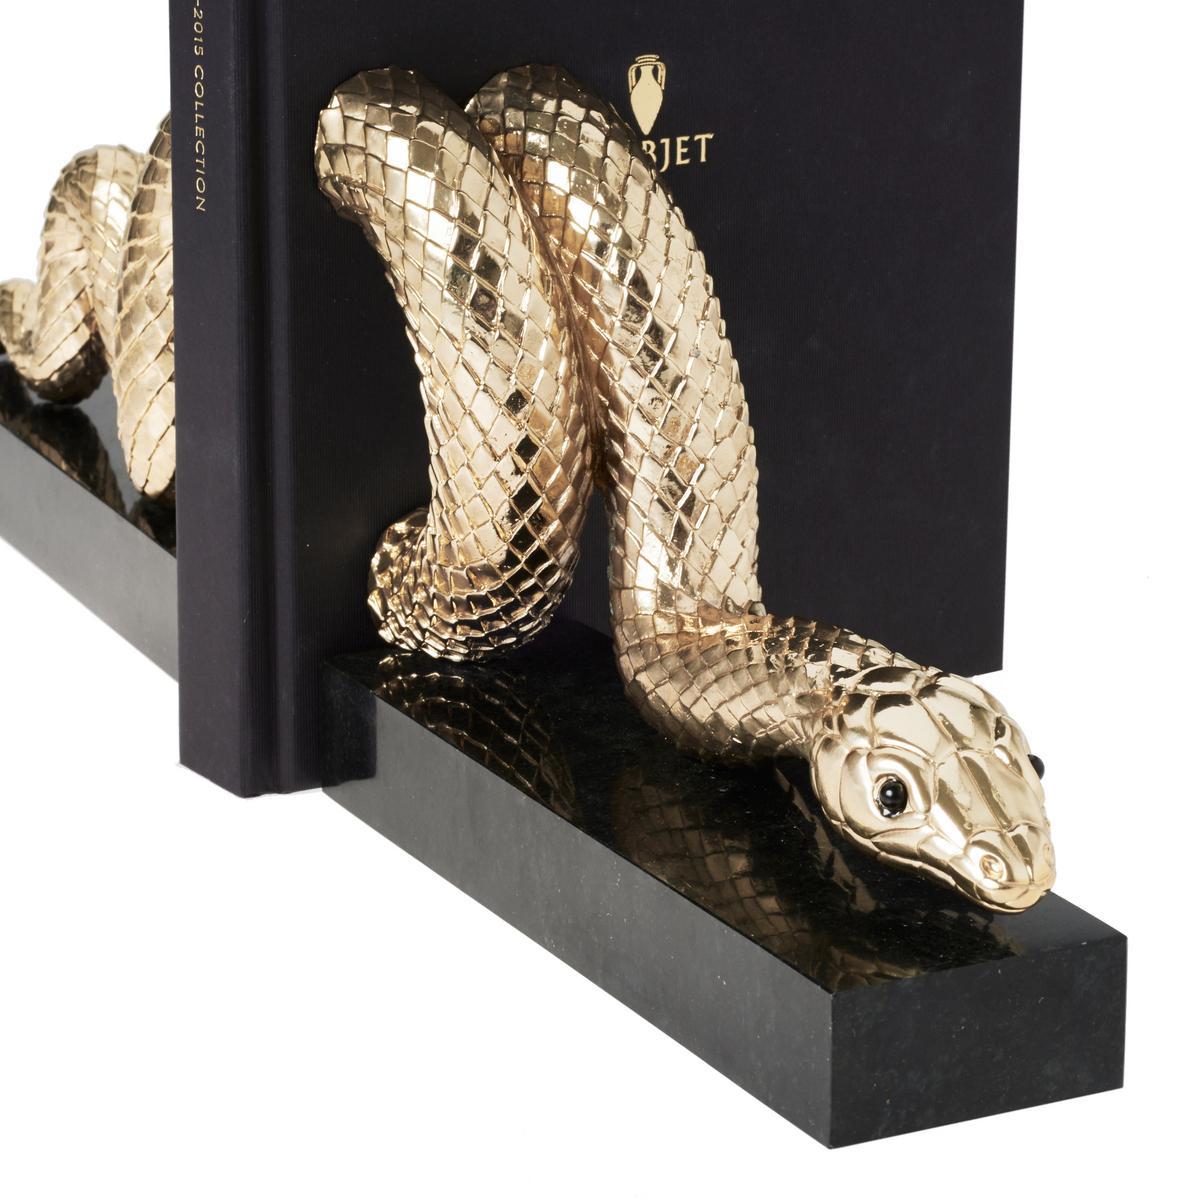 L Objet Snake Gold Bookends Set Of 2 Artedona Com